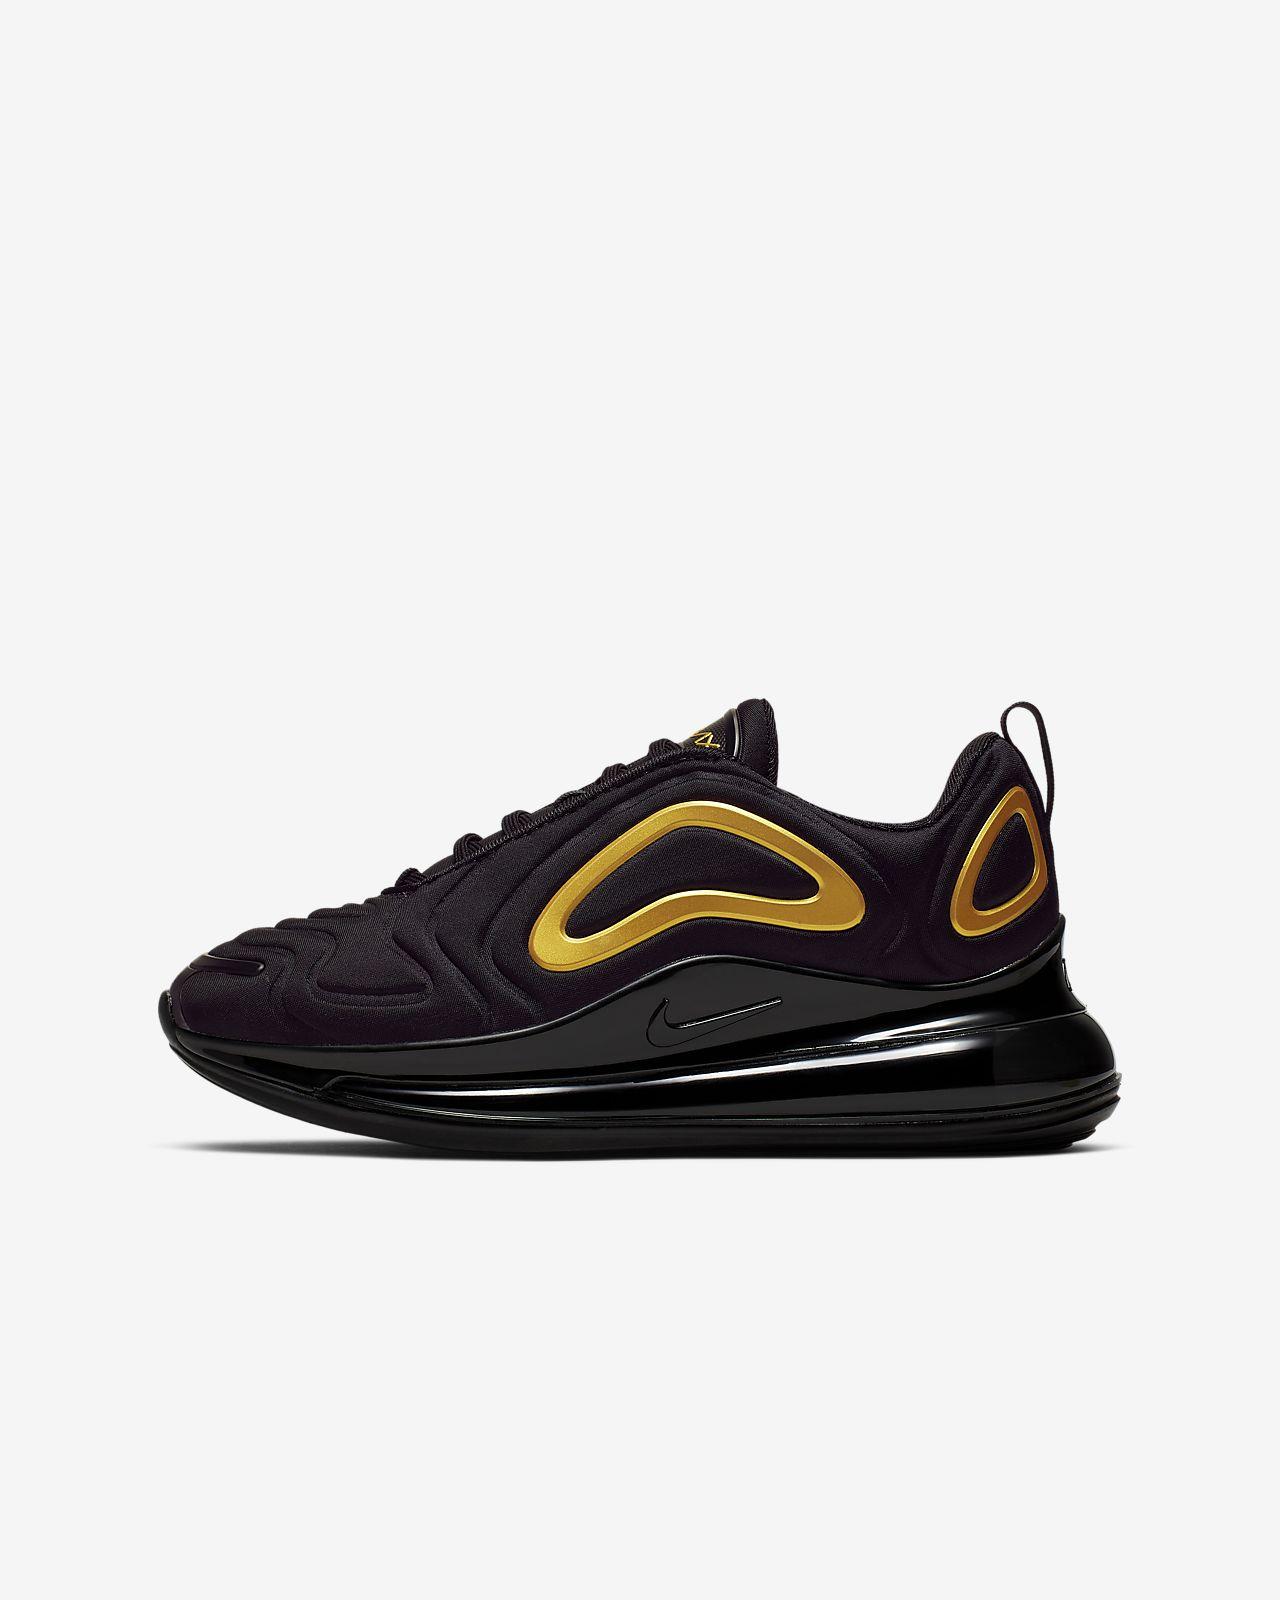 Nike Air Max 720 Schuh f��r j��ngere?ltere Kinder